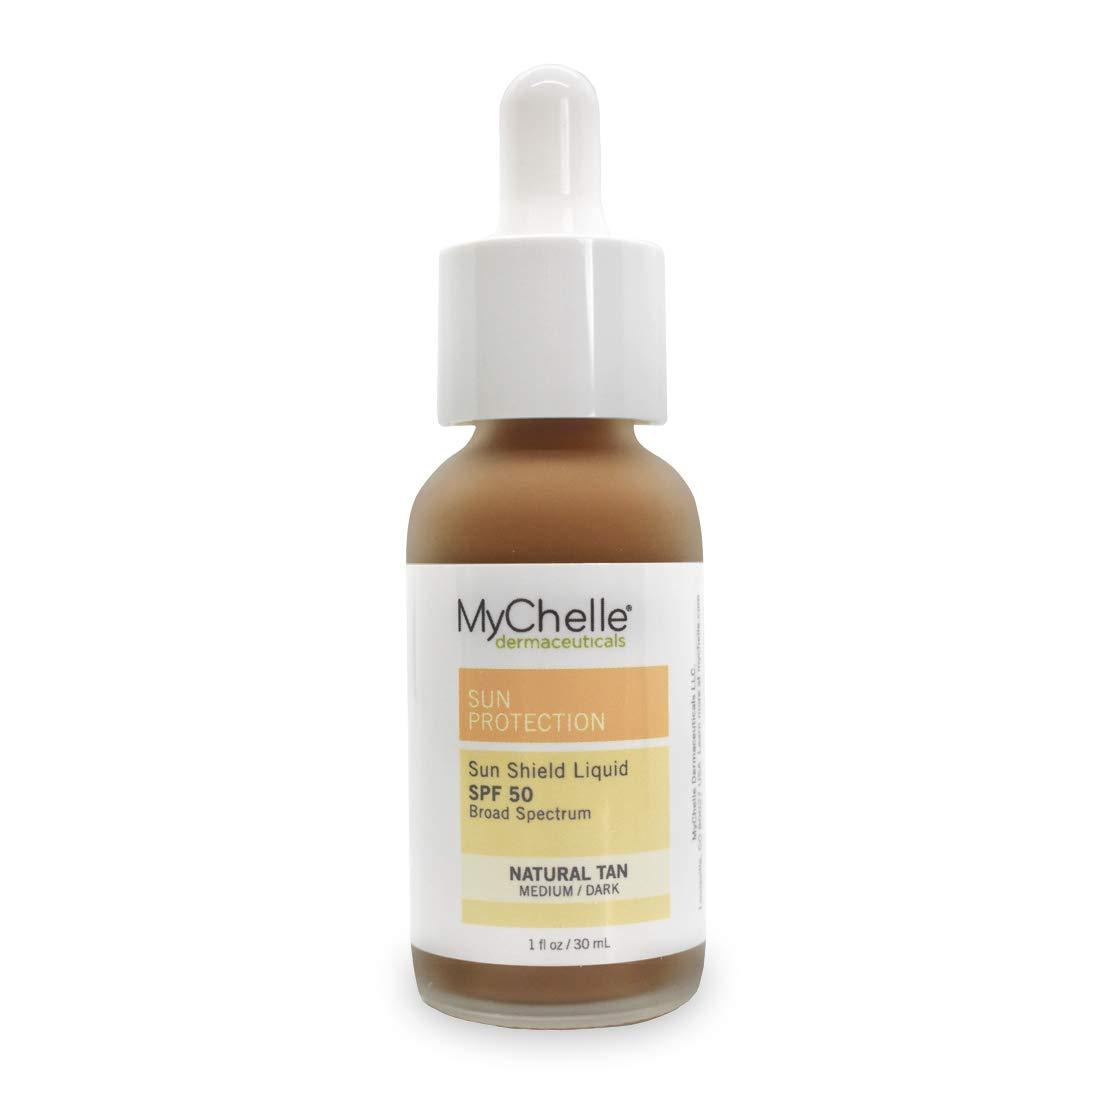 MyChelle Dermaceuticals Sun Shield Liquid Tint Spf 50 Natural Tan, oil-free daily Facial Broad Spectrum Sun Protection, All Skin Types, for Medium To Tan Complexion, Gluten Free & Vegan, 1 Fl Oz